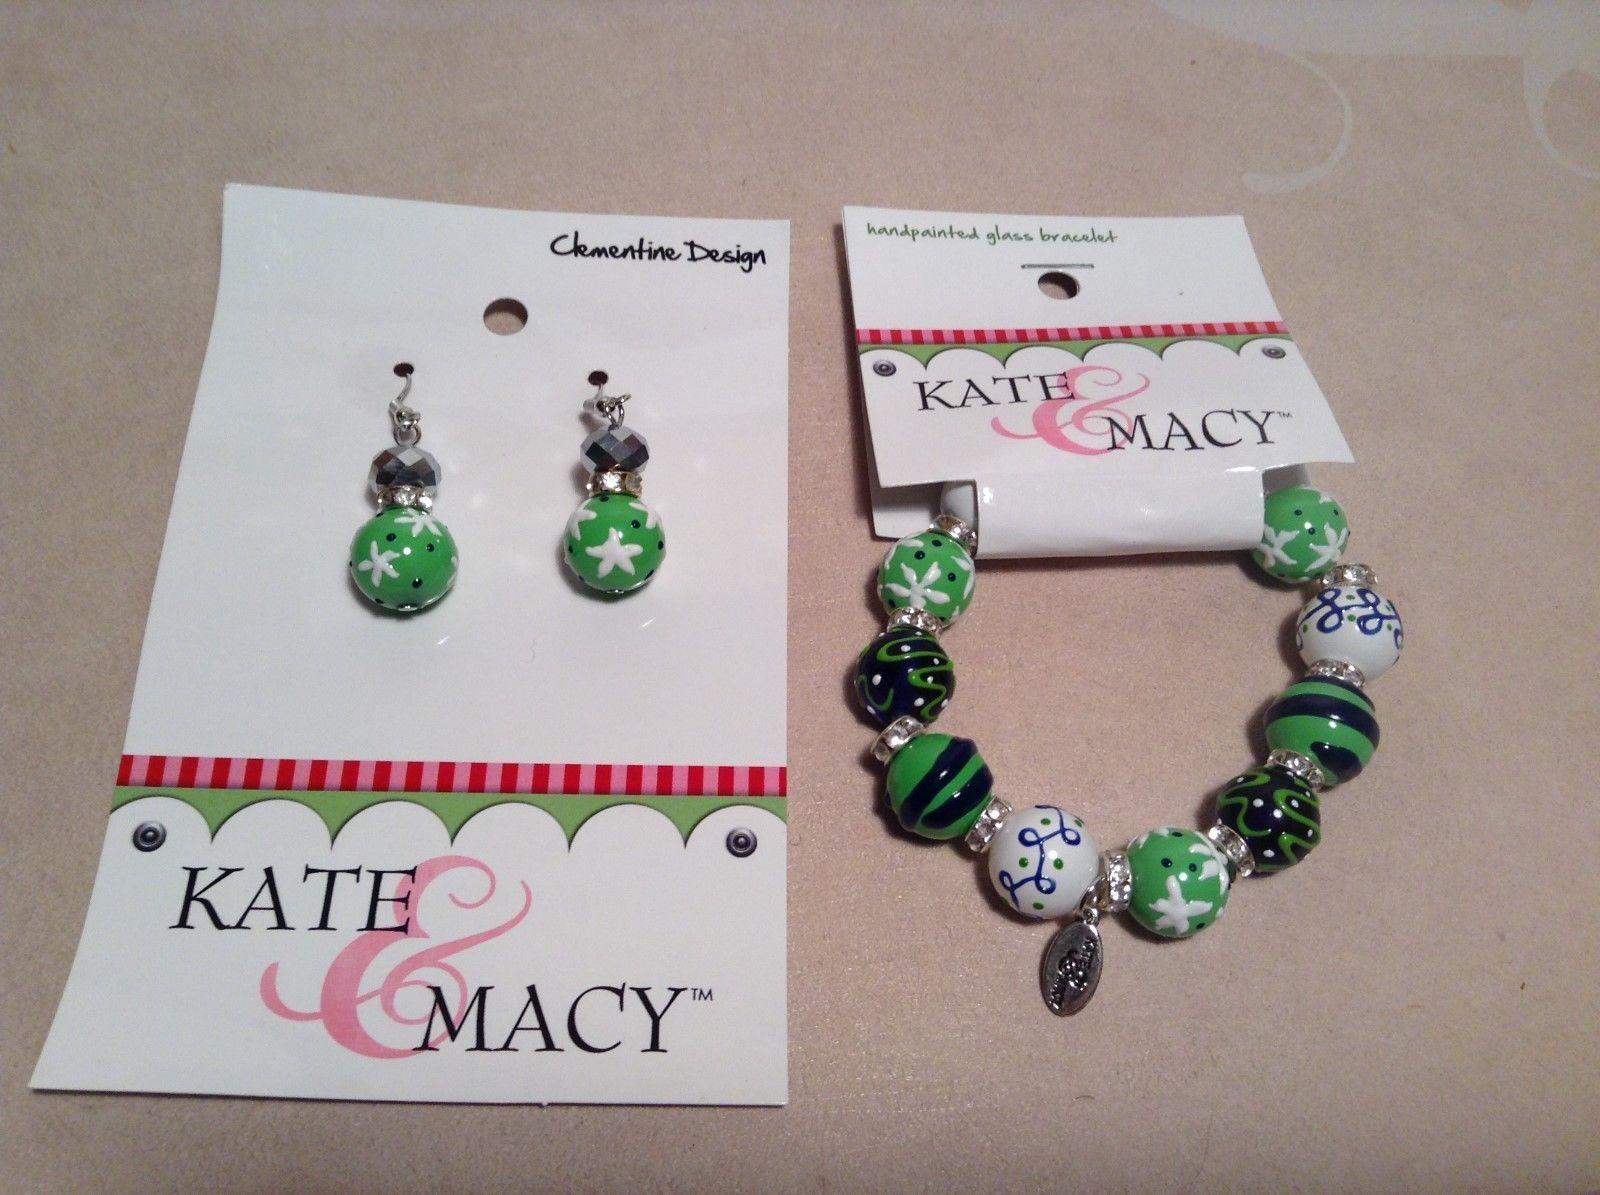 NEW Kate & Macy Green Hand Painted Glass Bracelet/Earring Set